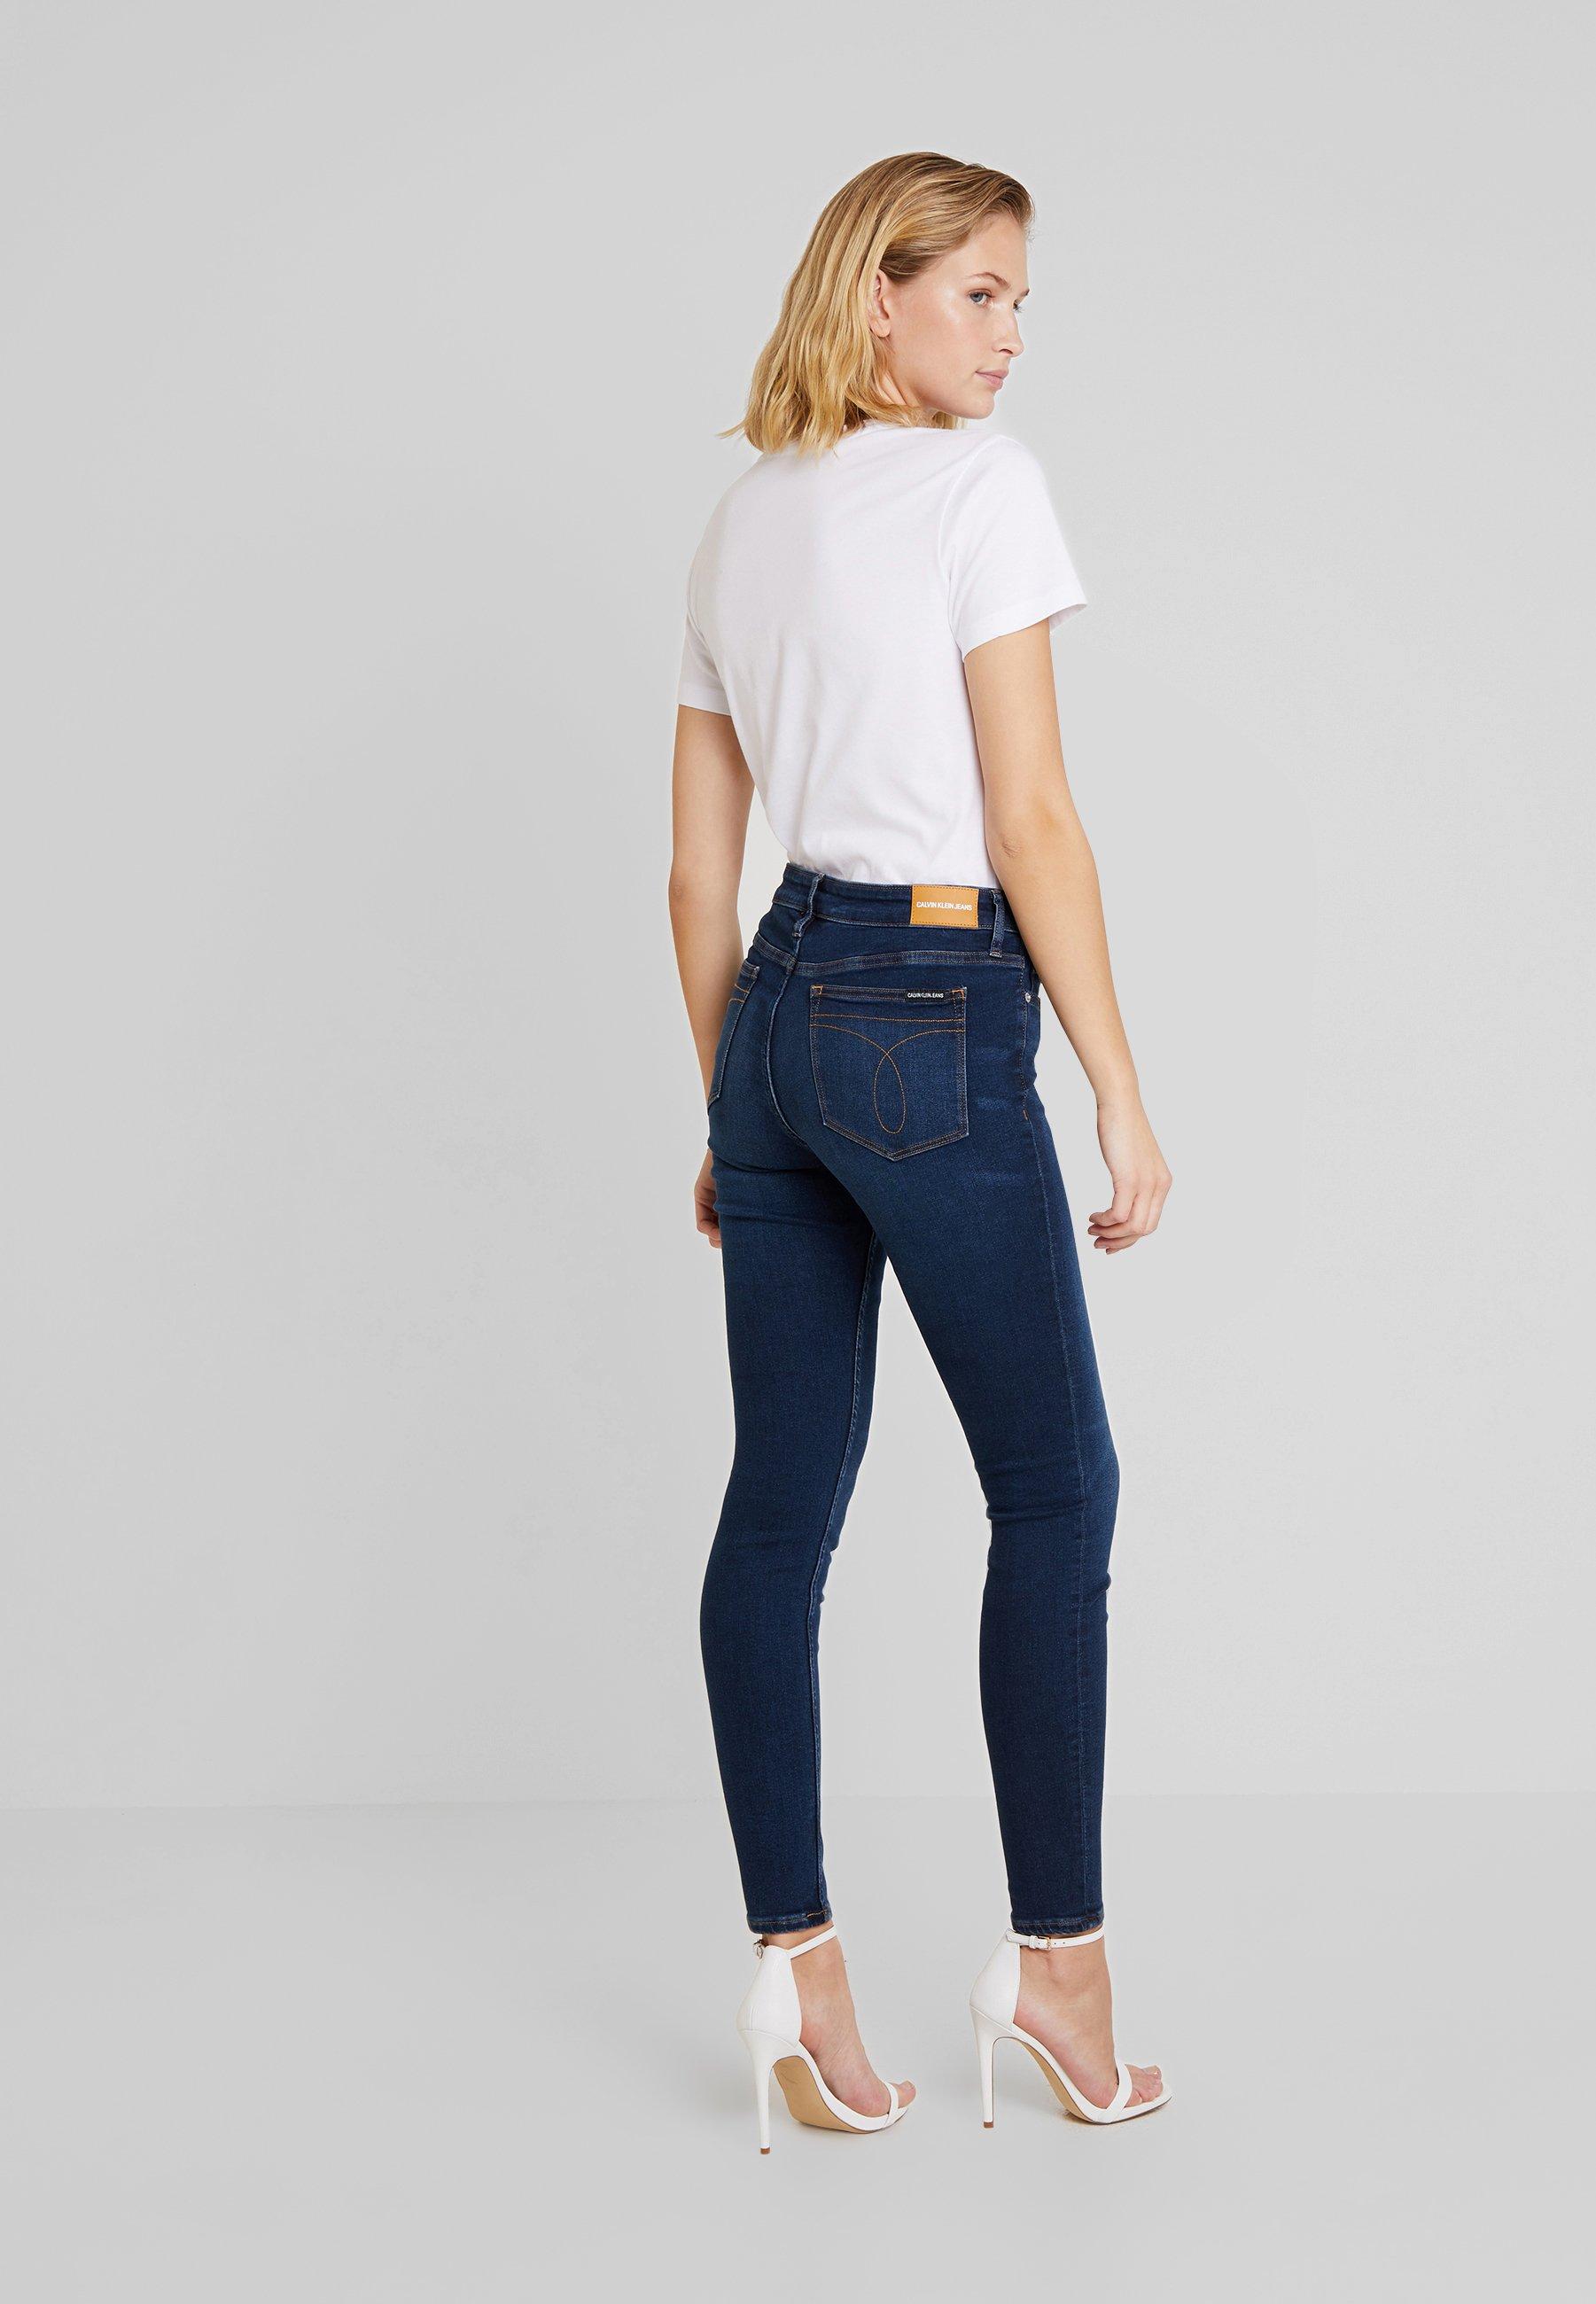 Jeans 001 Calvin Blue Super Klein SkinnyVanern Ckj otxdshQrBC